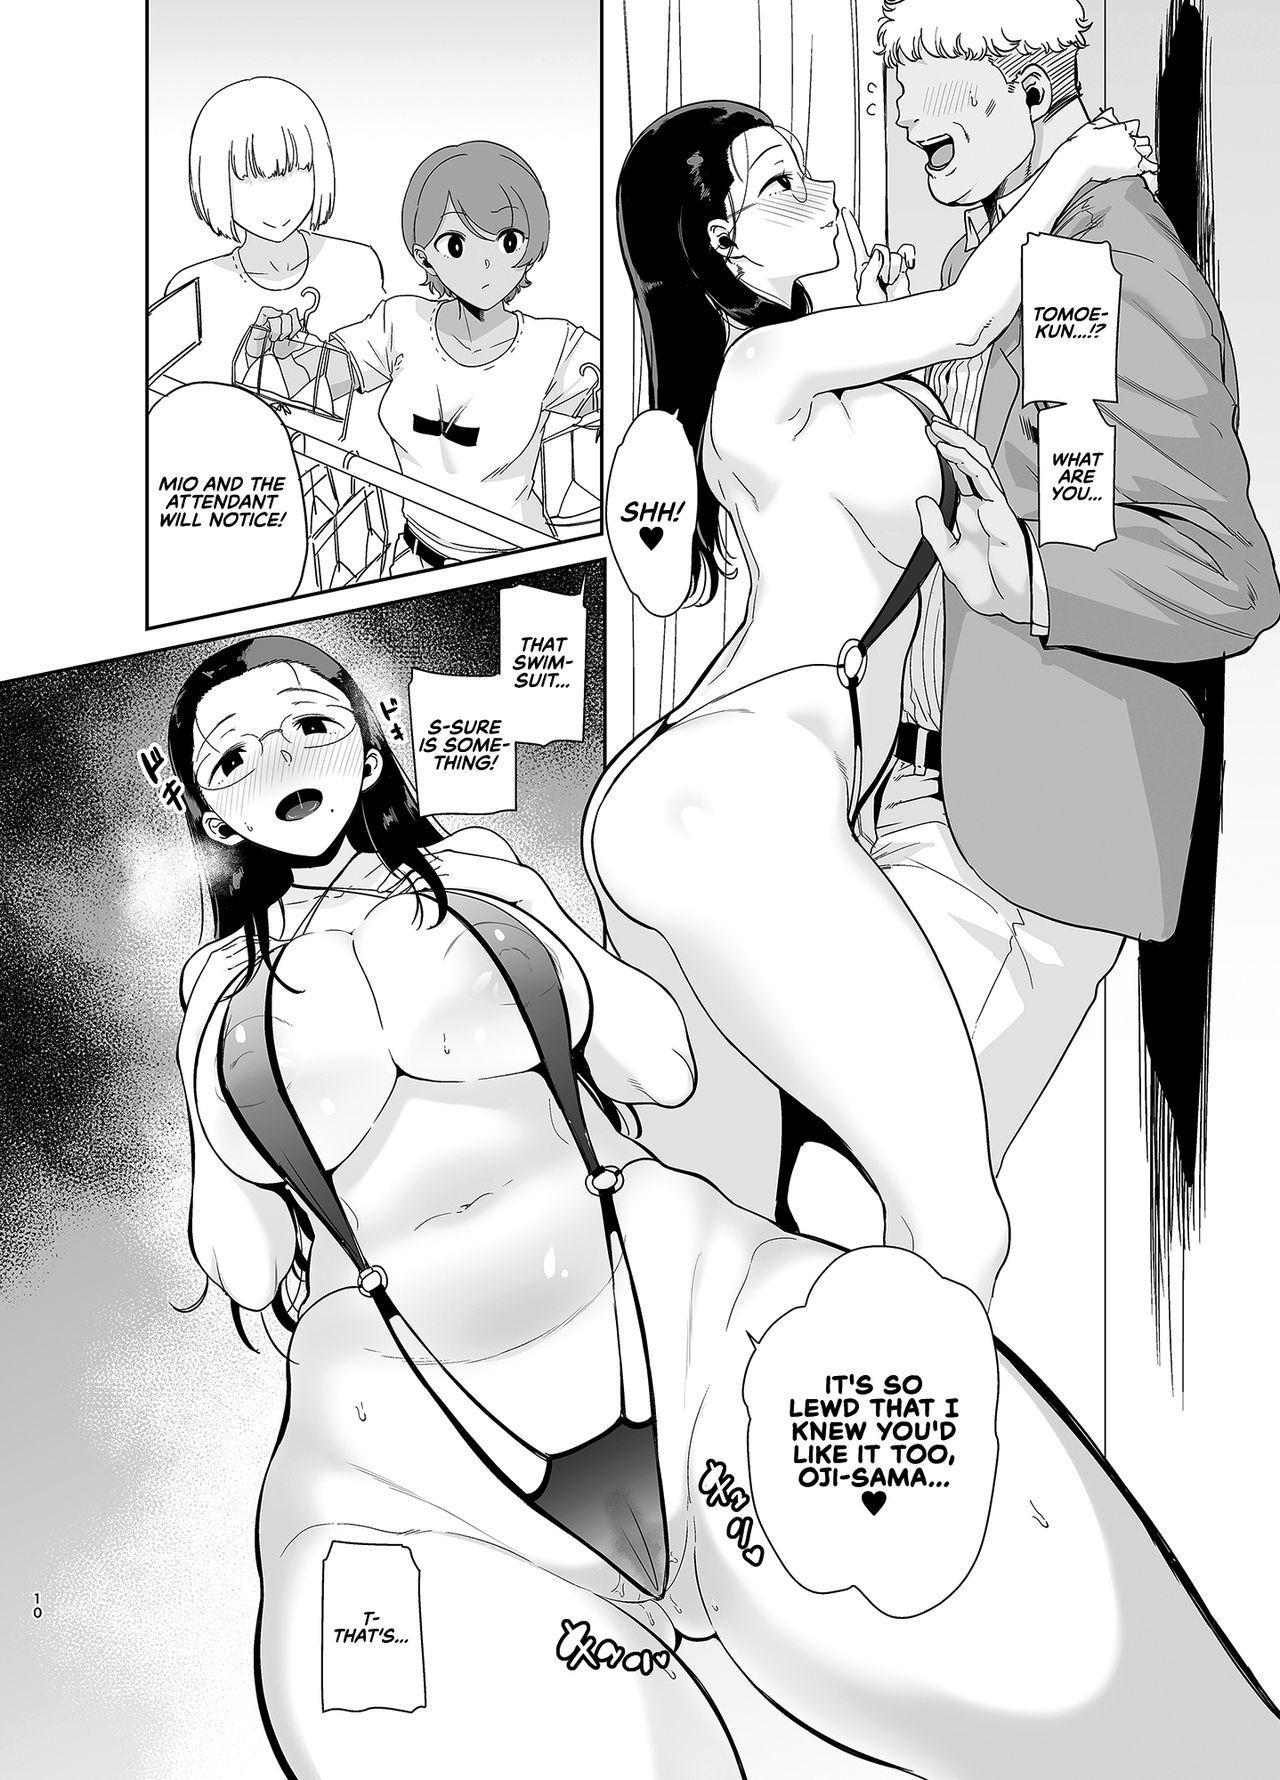 [DOLL PLAY (Kurosu Gatari)] Seika Jogakuin Koutoubu Kounin Sao Oji-san 3 | Seika Girls' Academy Official Rod Oji-san 3 [English] [RedLantern] [Digital] 9